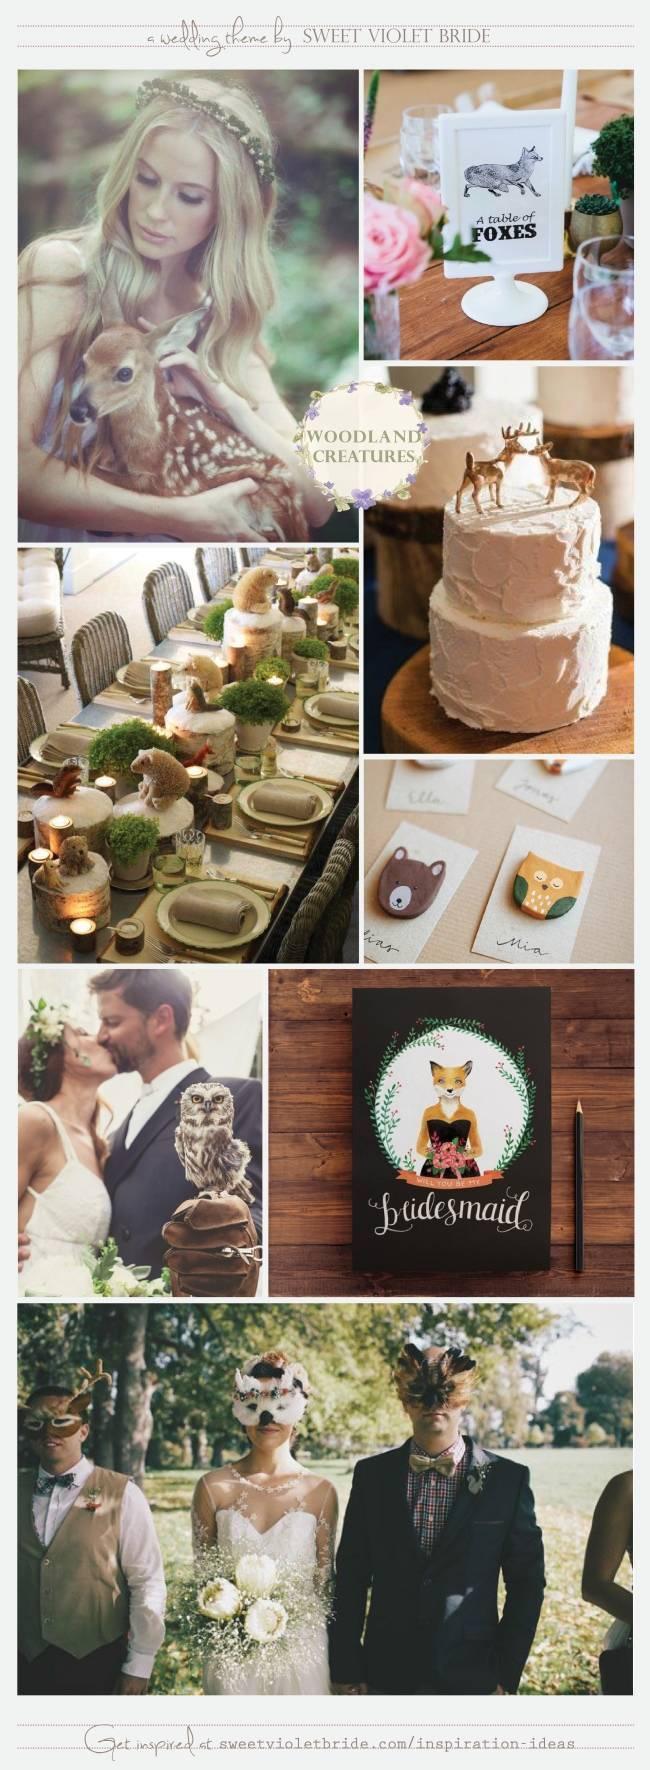 Wedding Theme Board 30 - Woodland Creatures